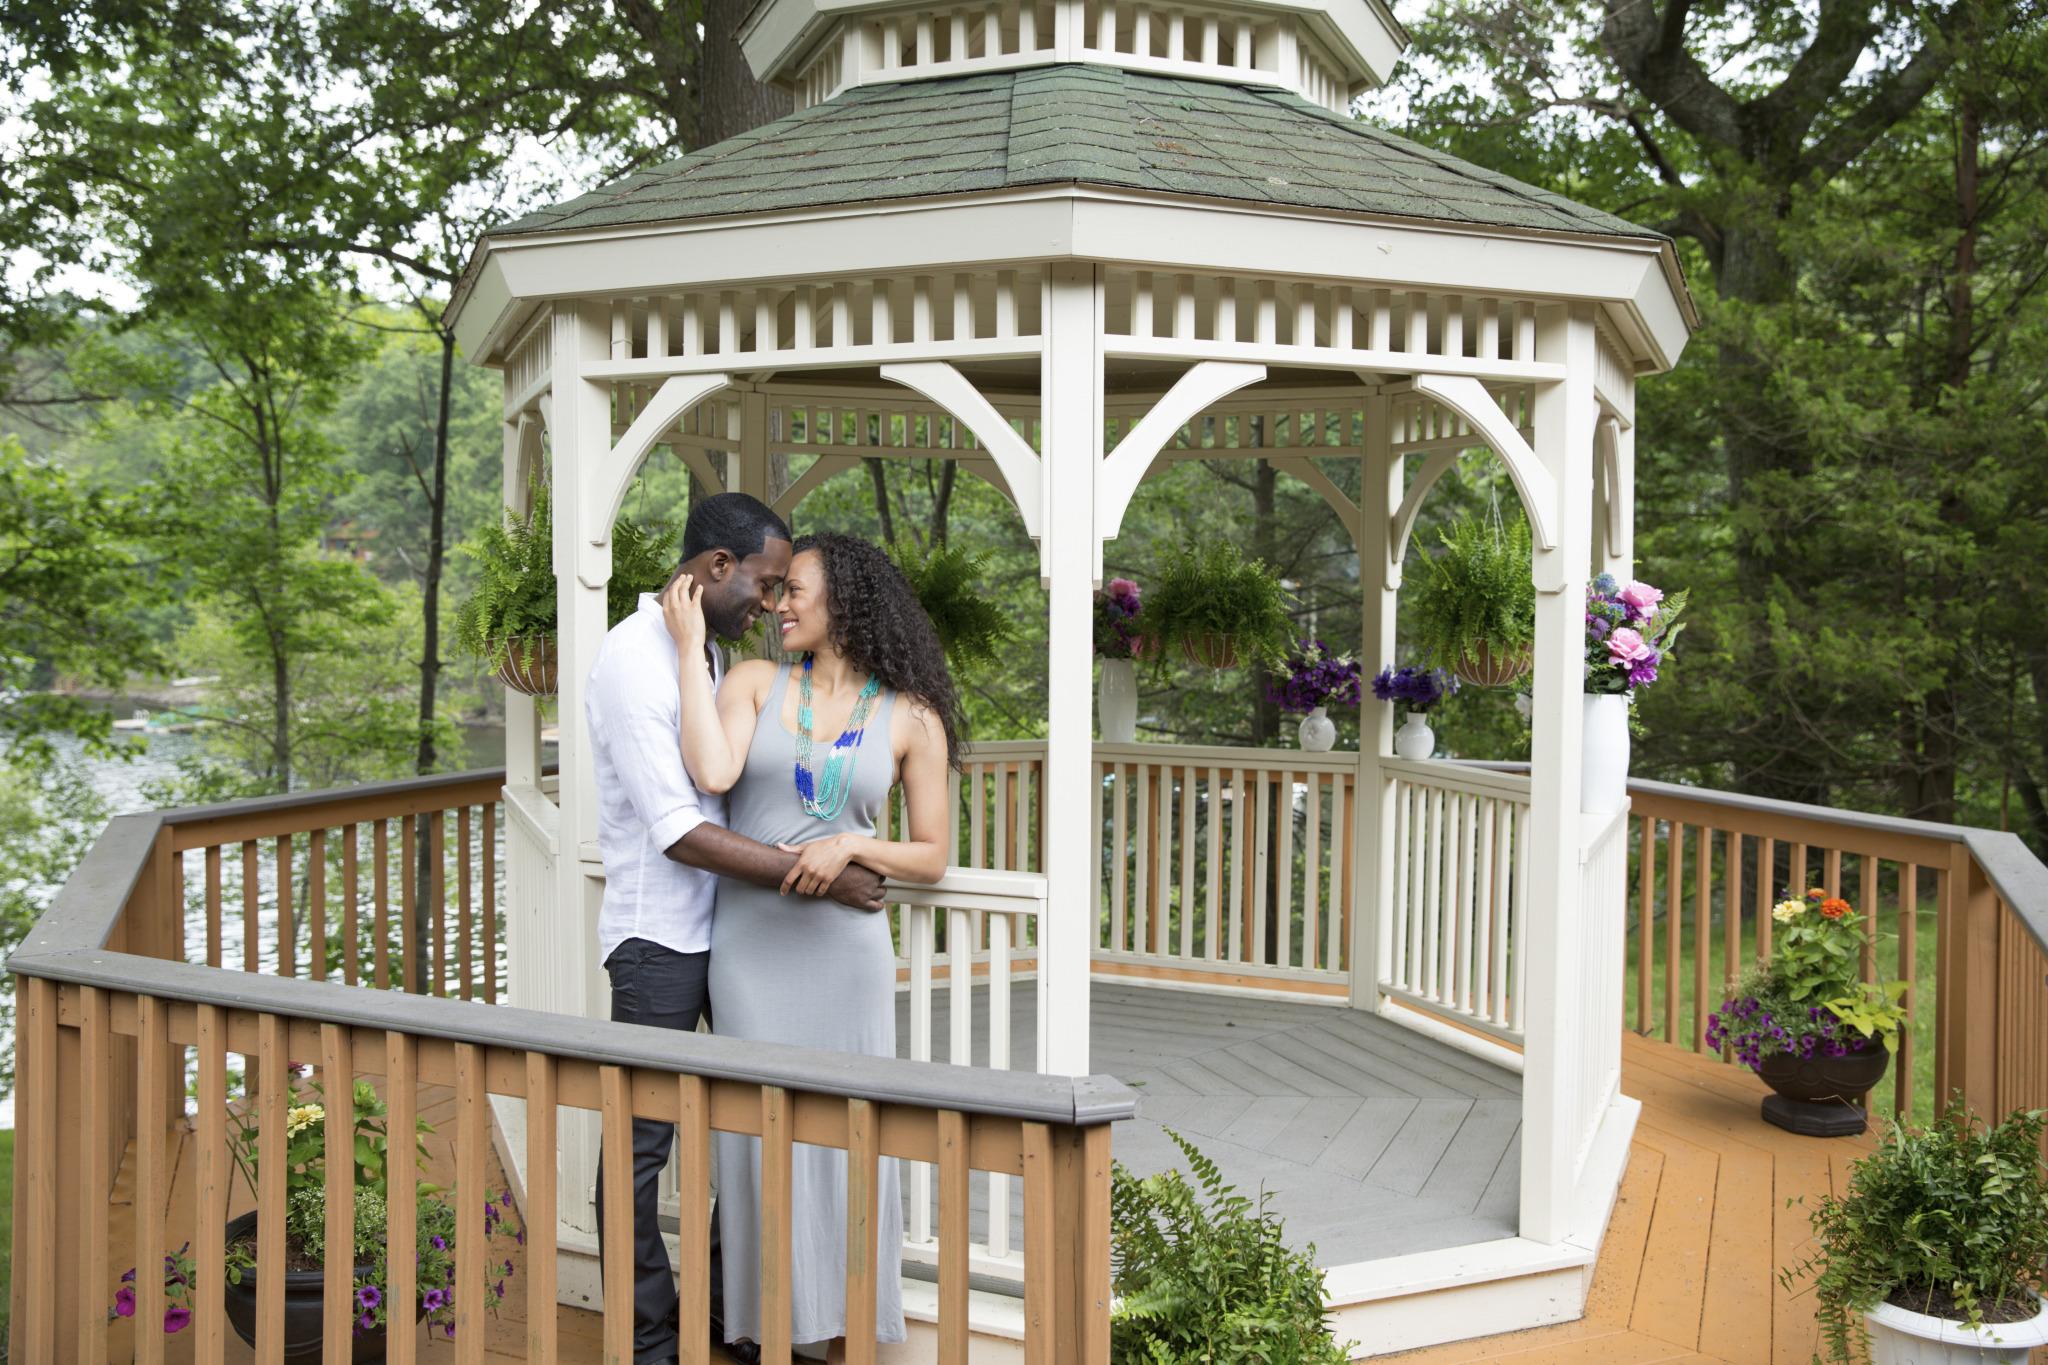 Poconos Adults Only Romantic Getaways To The Pocono Mountains